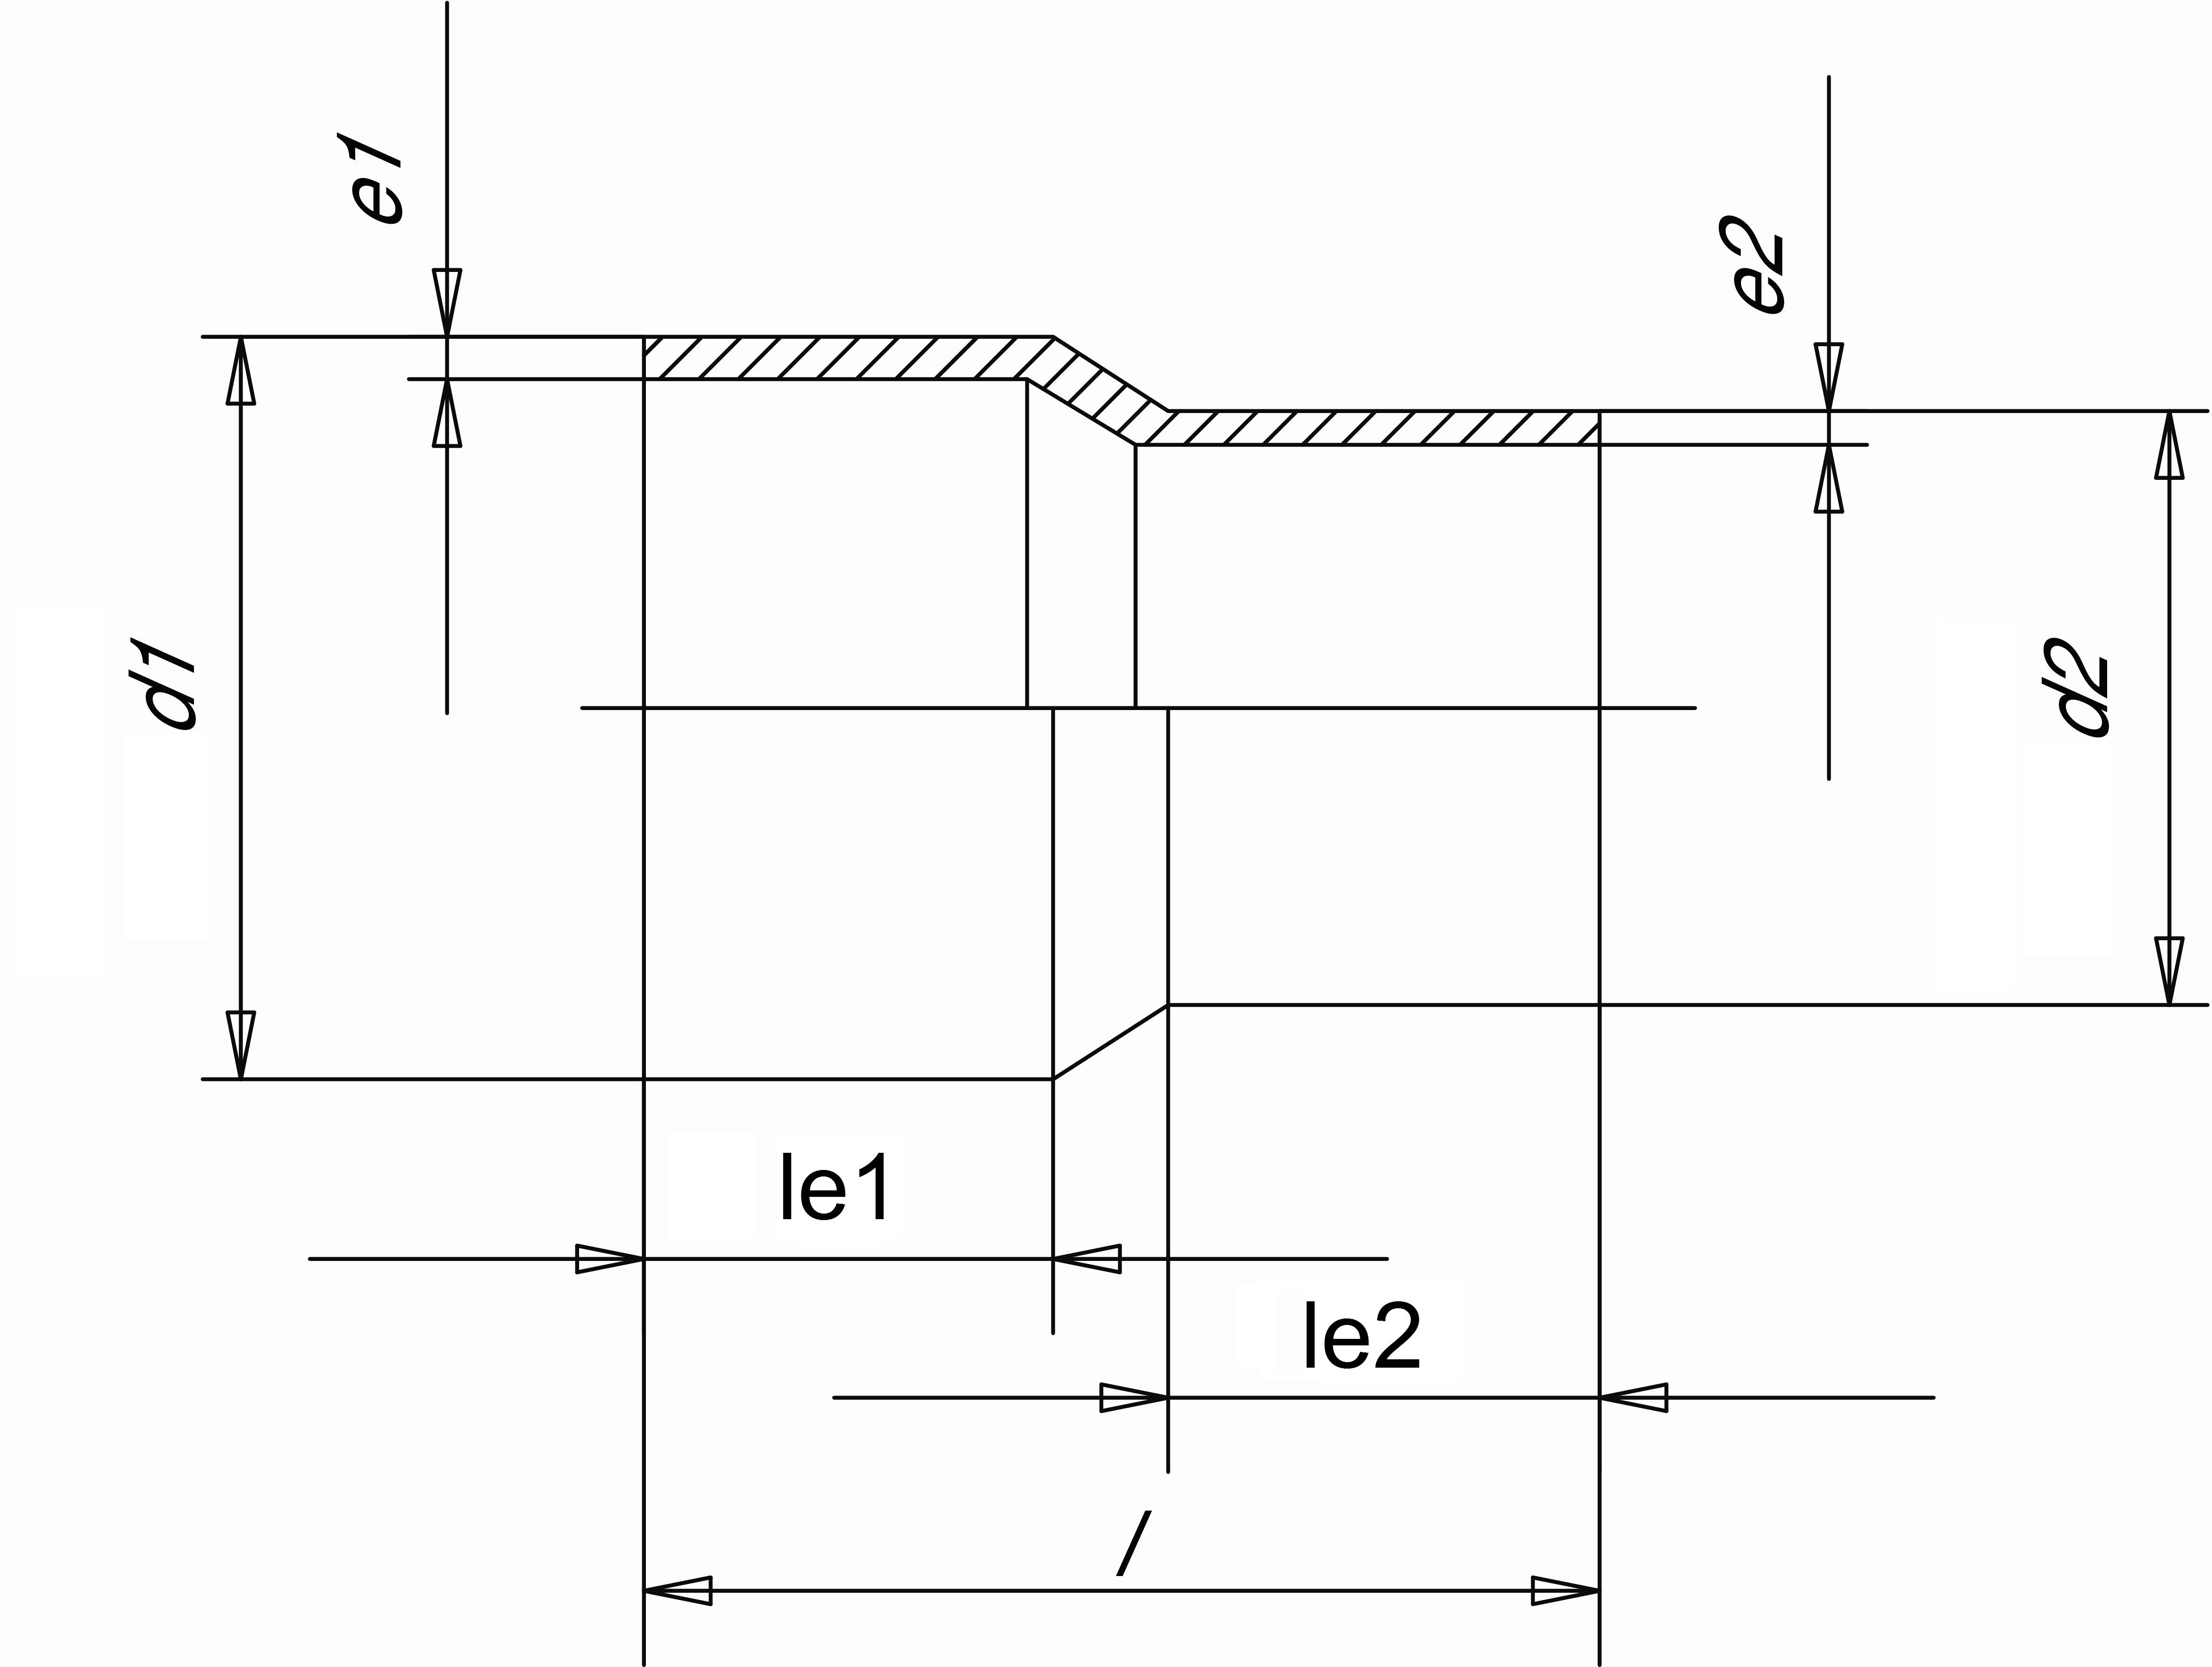 Муфта редукционная (Simona) 40x32 SDR21 PN16